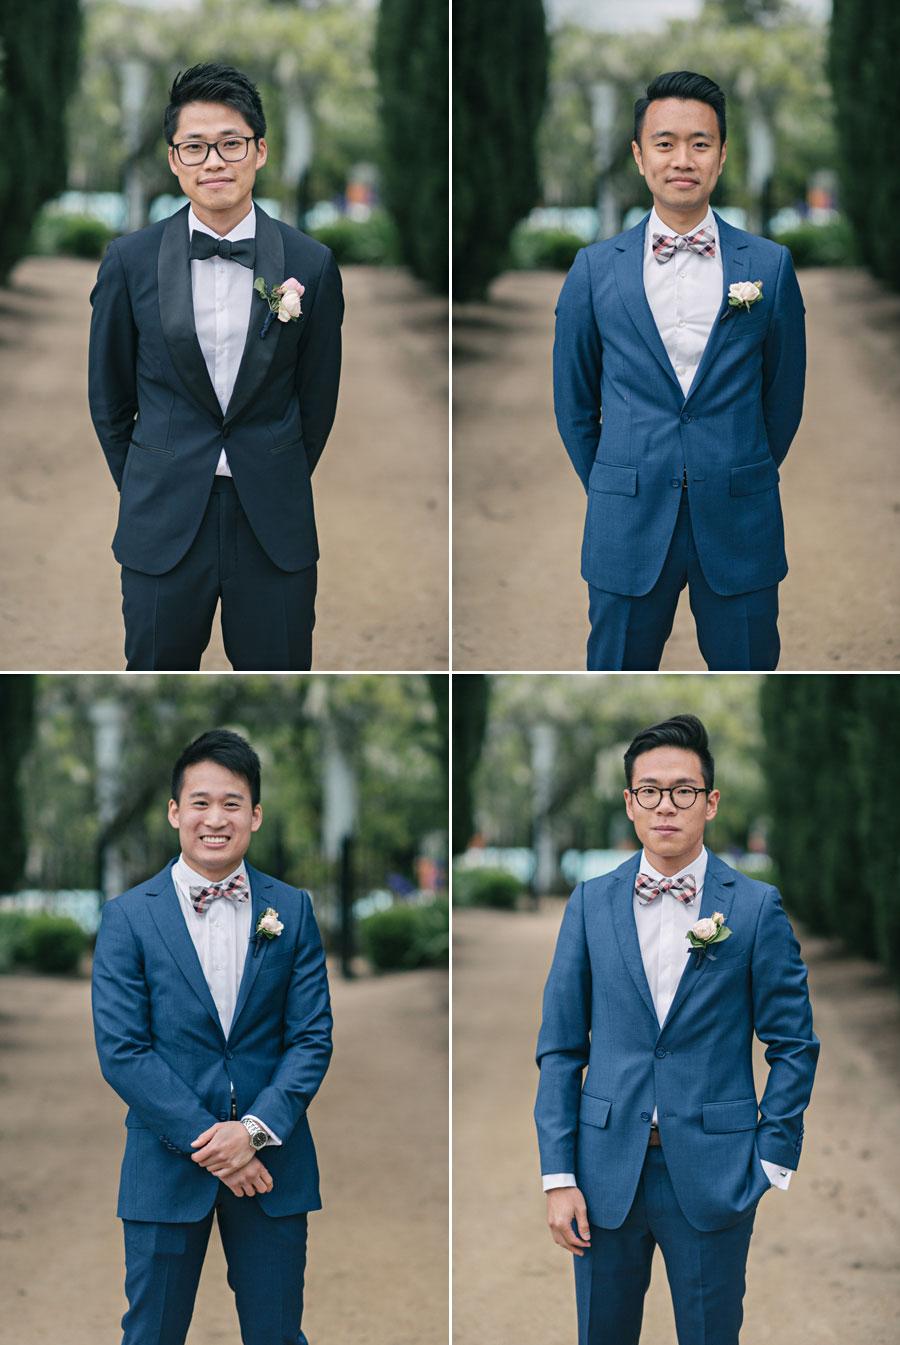 wedding-photography-coombe-yarra-valley-bella-emerson-086.jpg